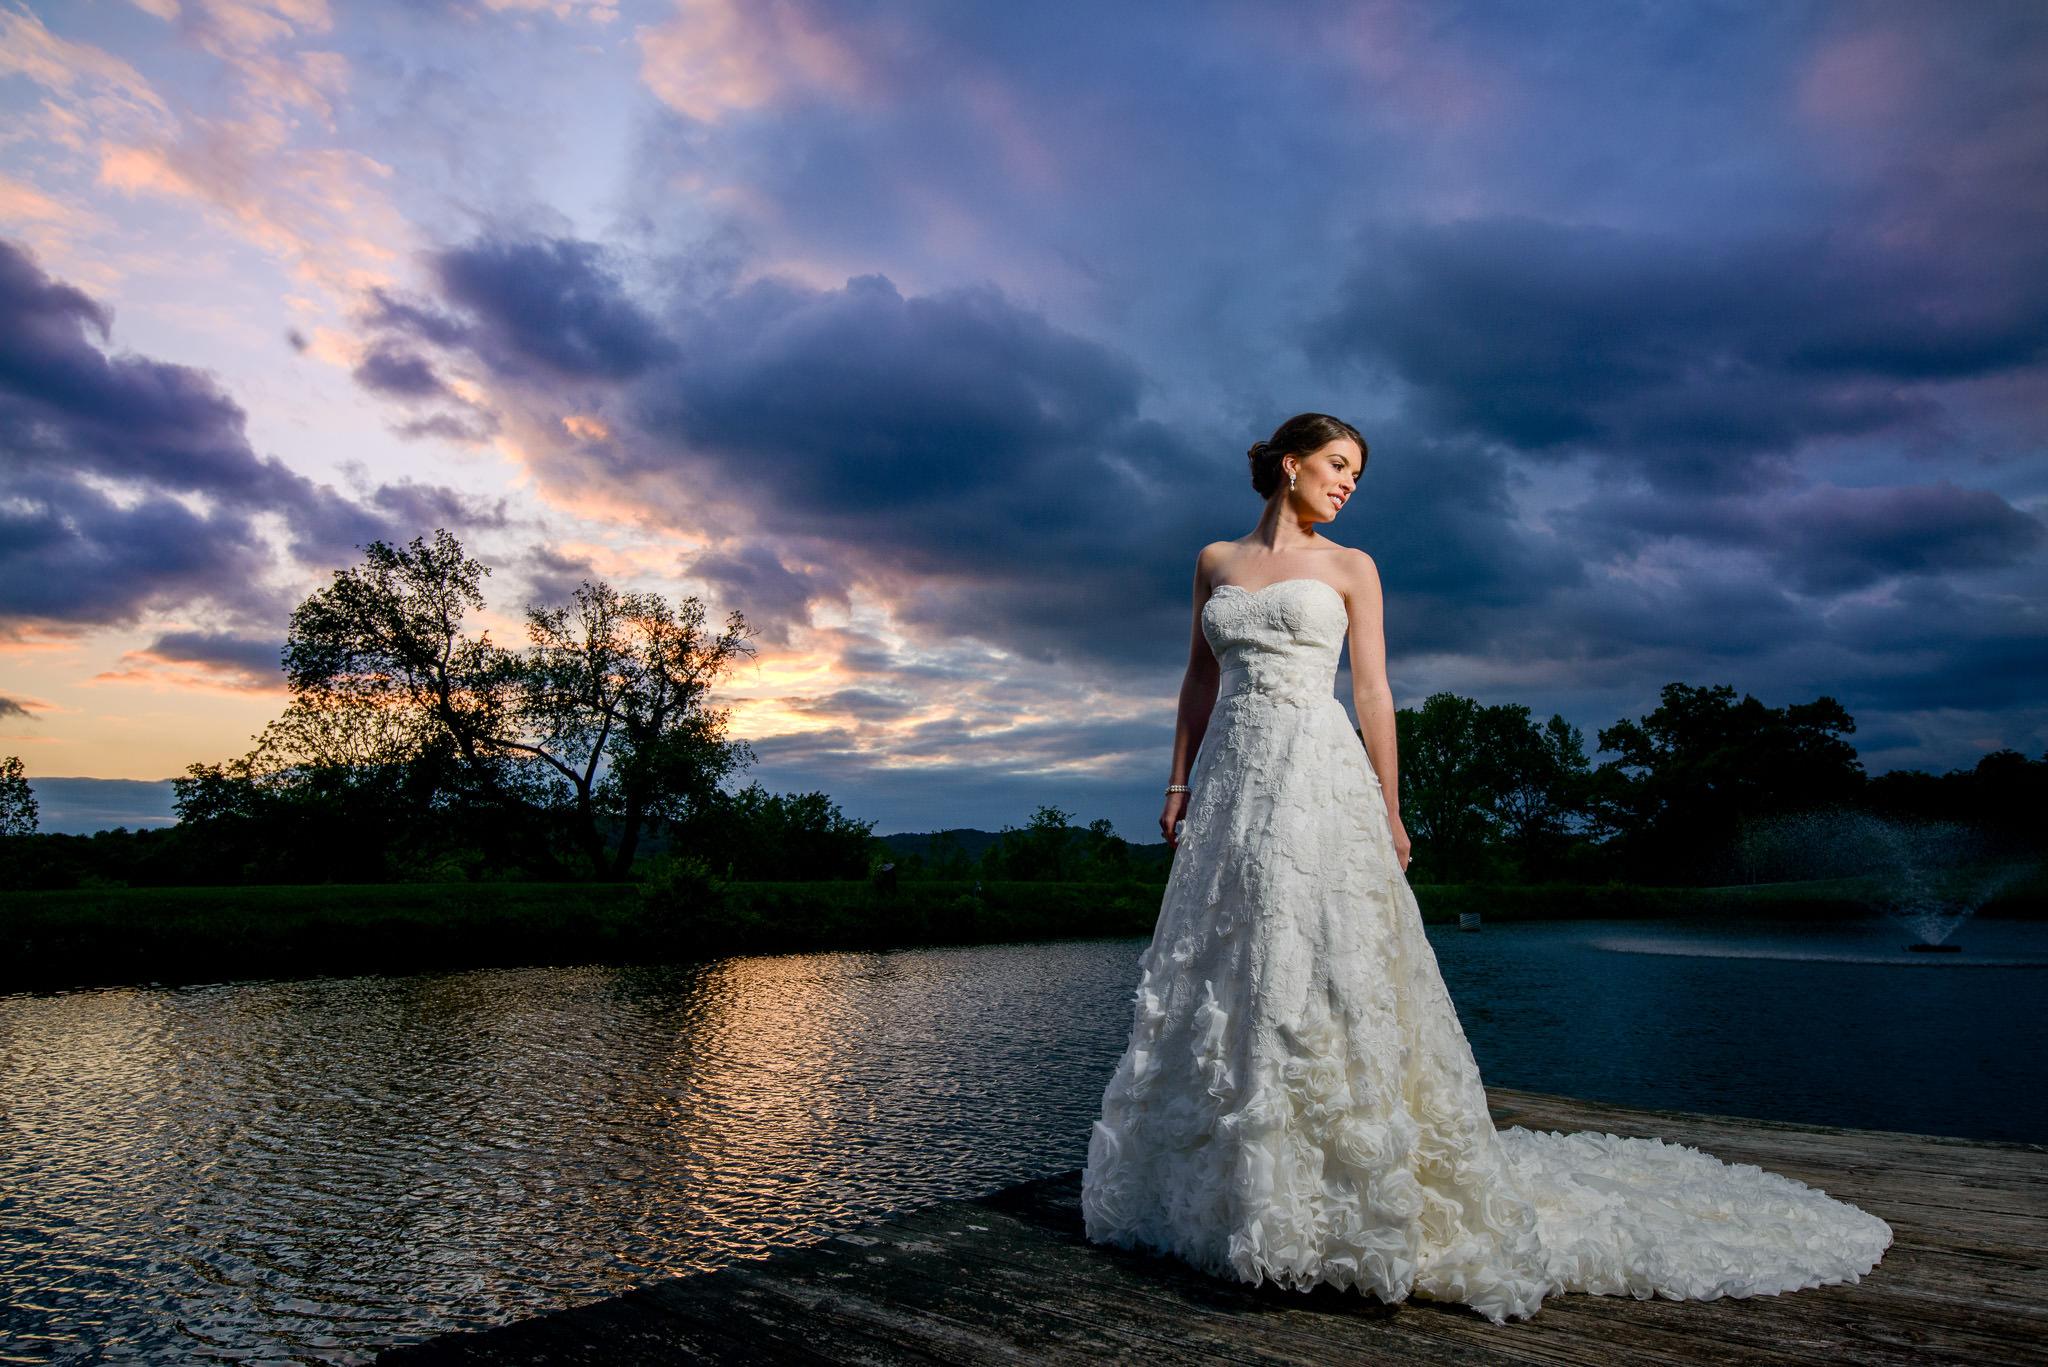 Greg and Jess Photography Nashville Portrait and Wedding Photographer 24.jpg